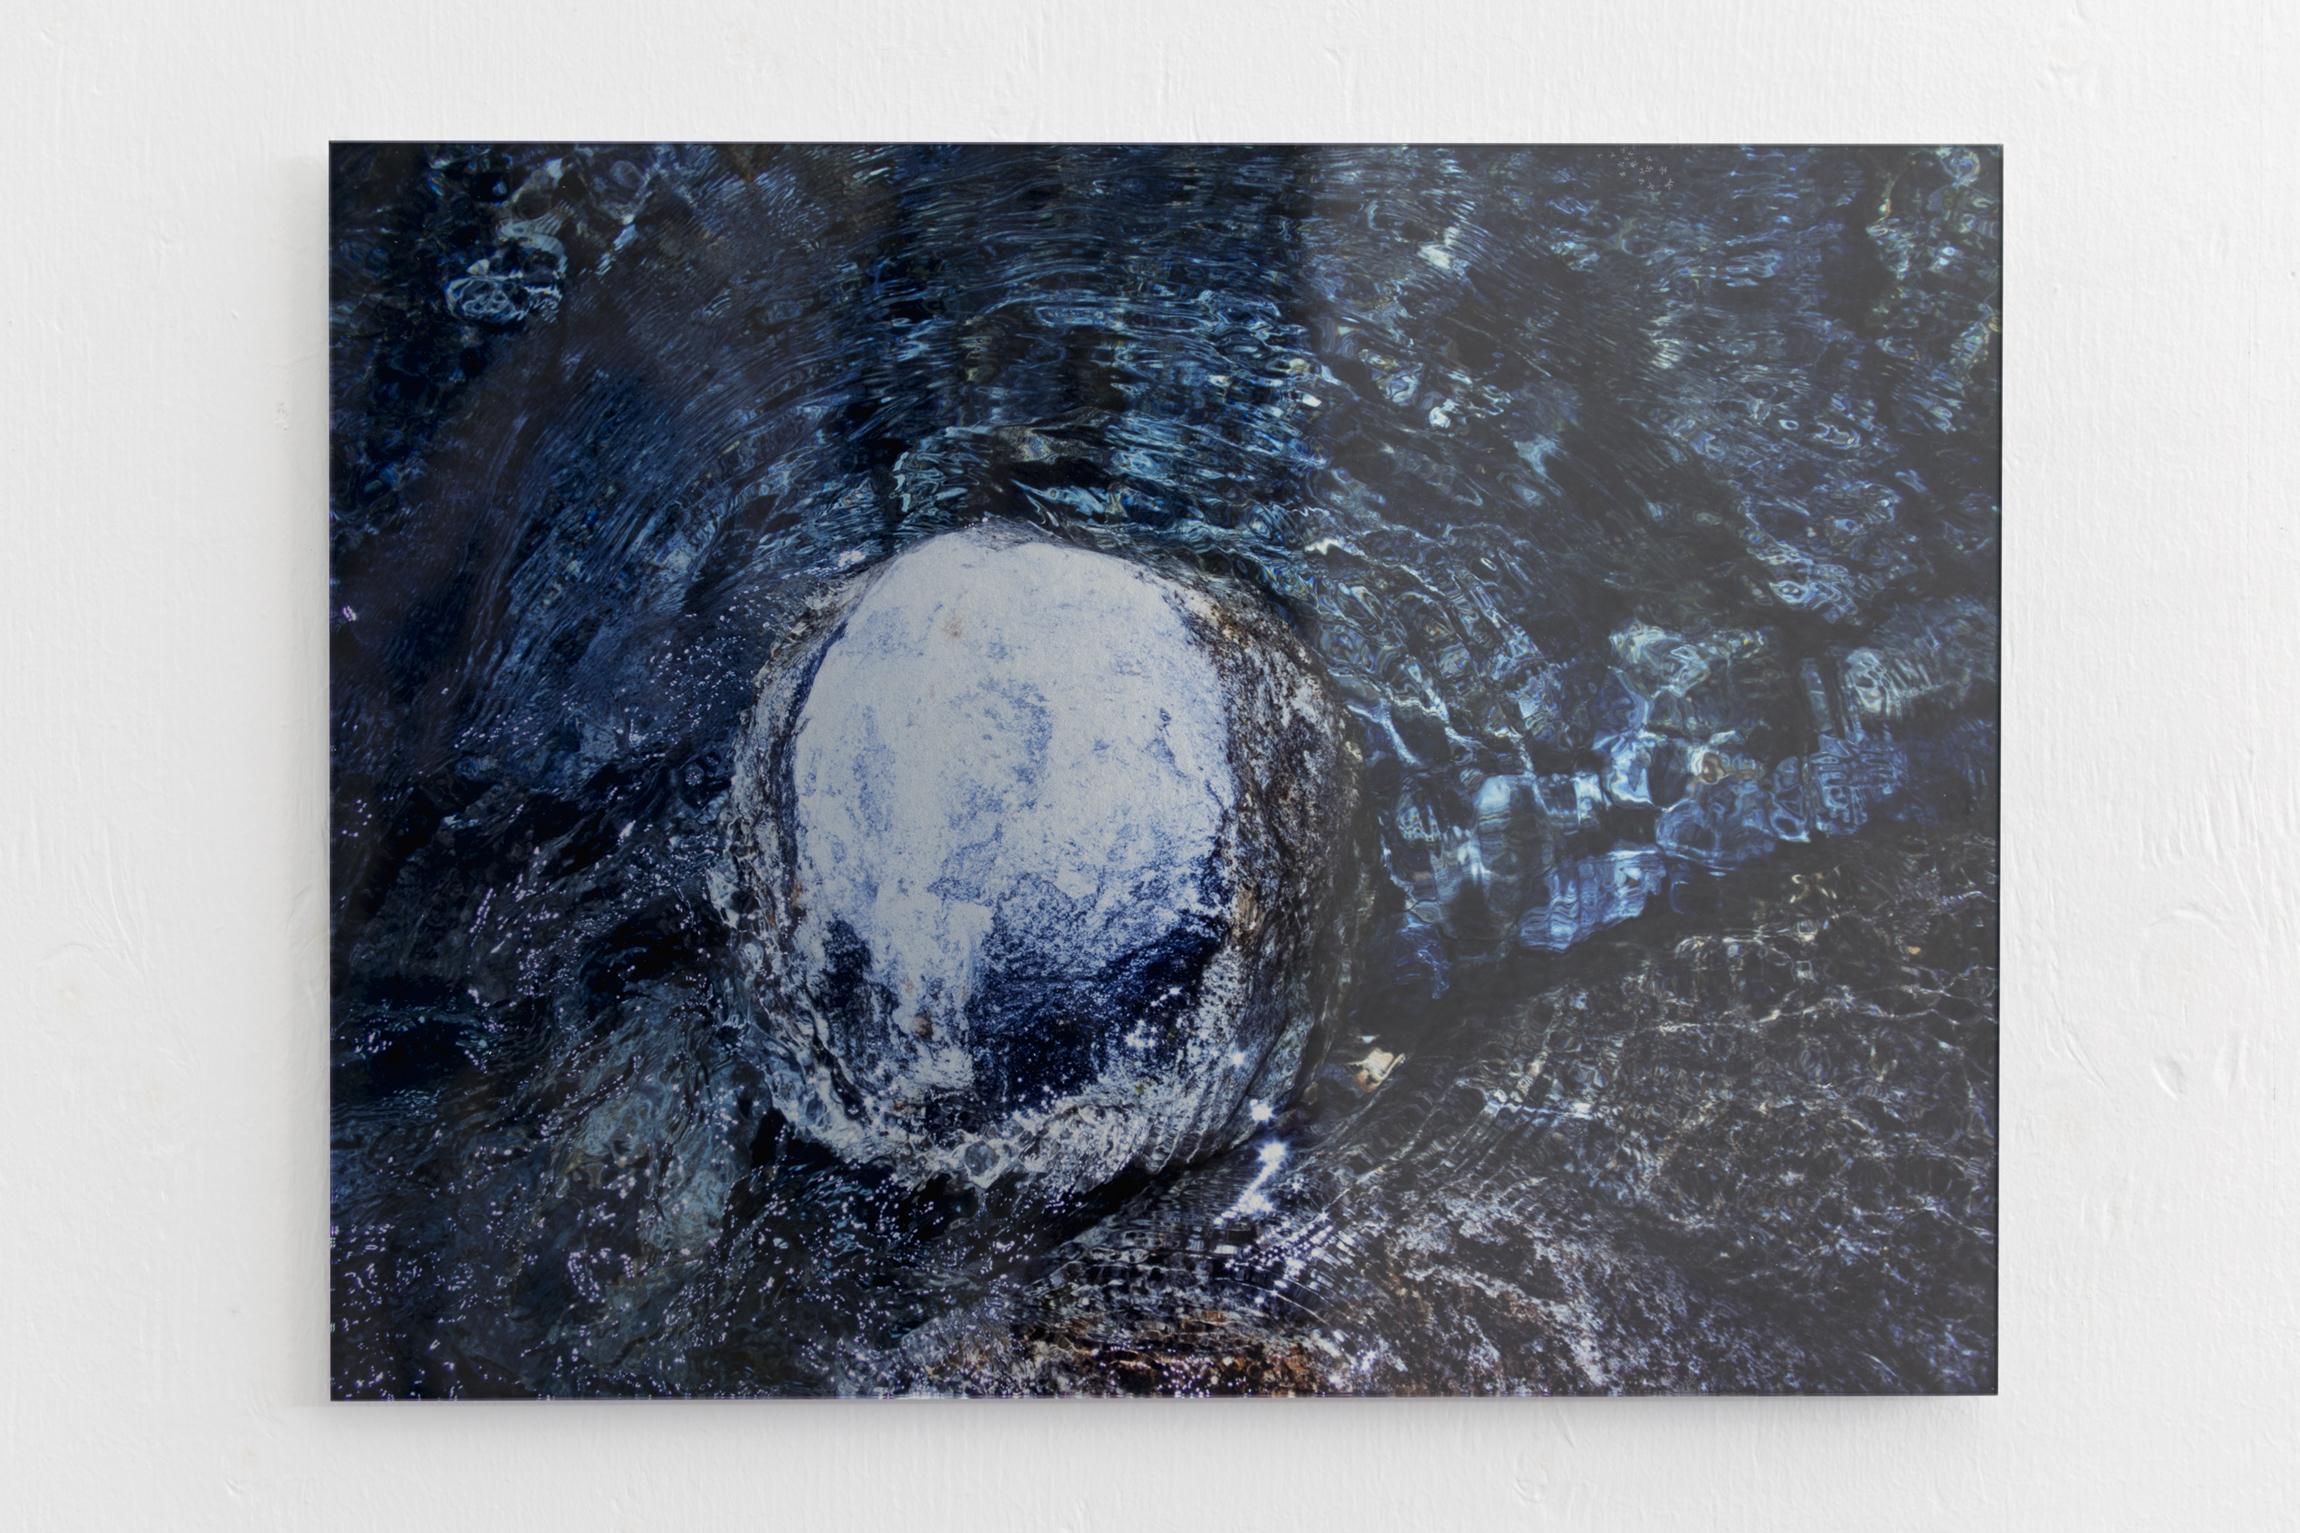 Maya Rochat, A Rock is A River, 2017. inkjet on metallic paper, polished glass. 30 x 21cm.